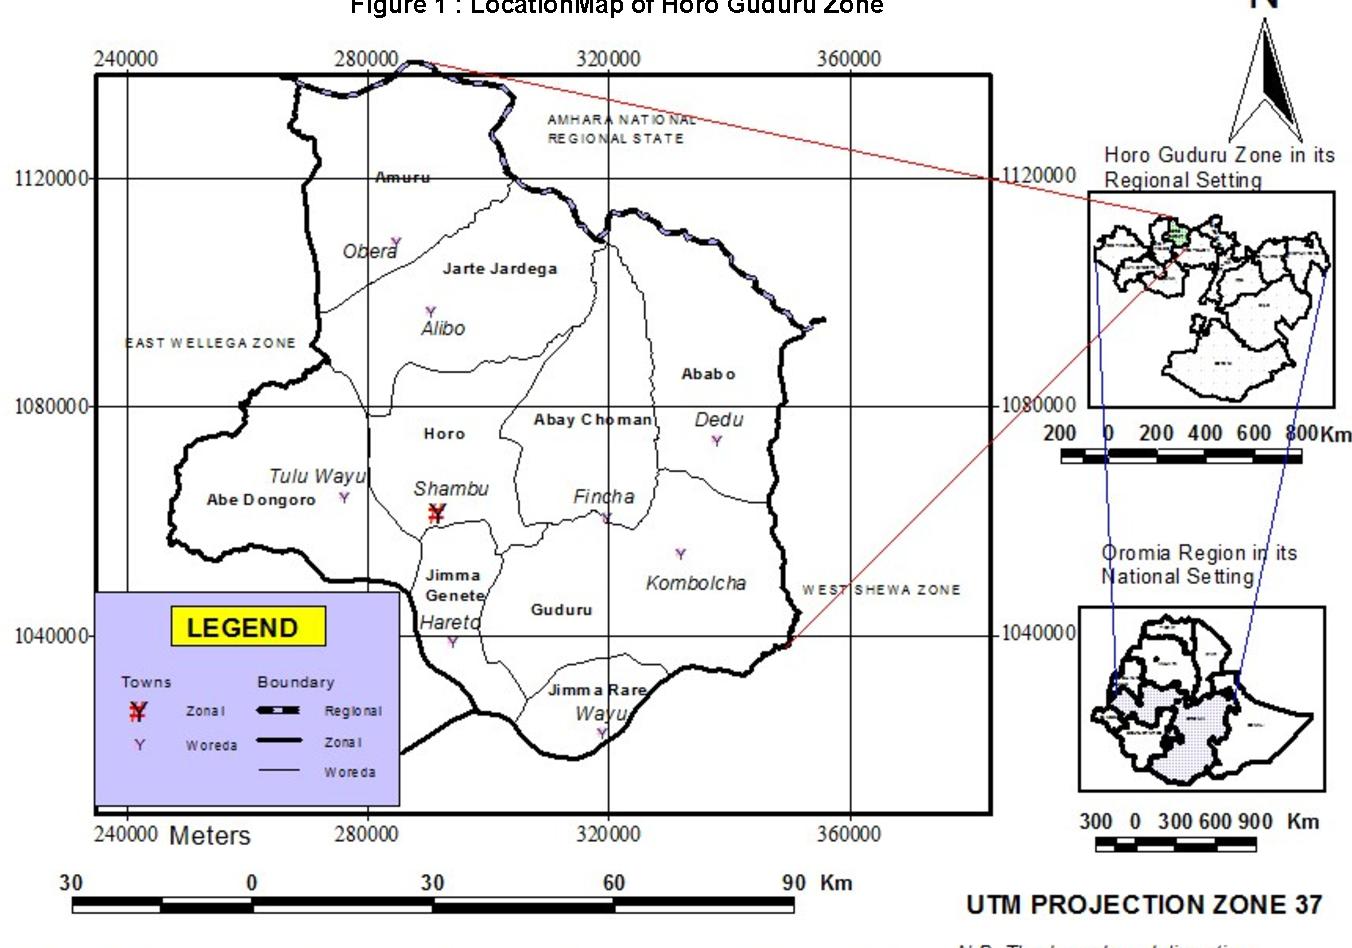 PDF] ETHNOMEDICINAL EXPLORATION OF HAANQUU FRUIT AMONG THE OROMO OF